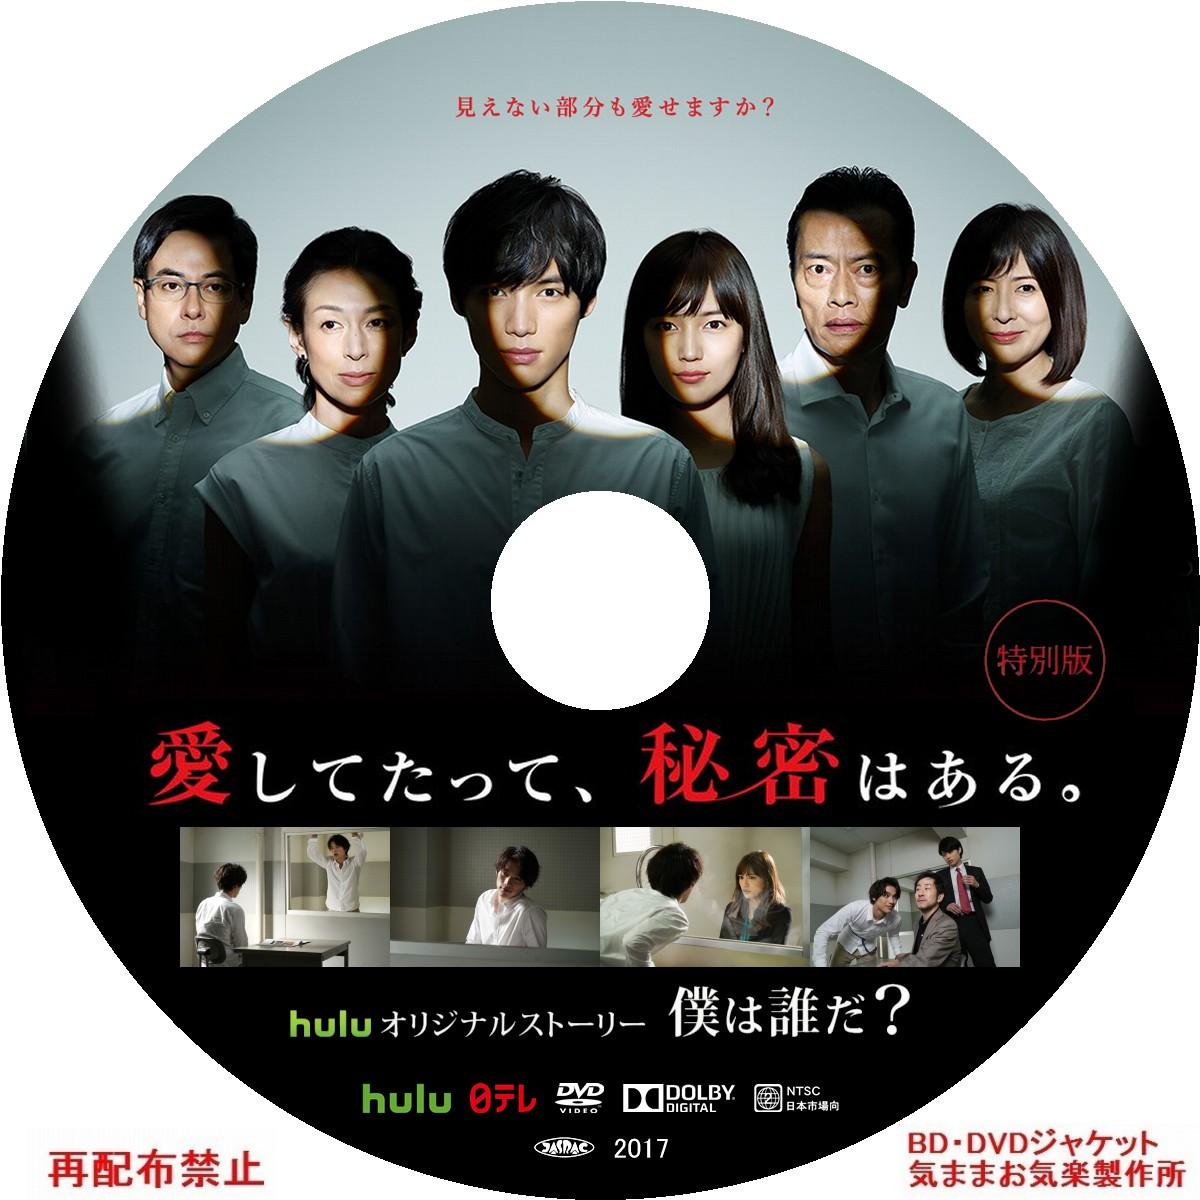 aishitetatte_tokubetsuban_DVD.jpg